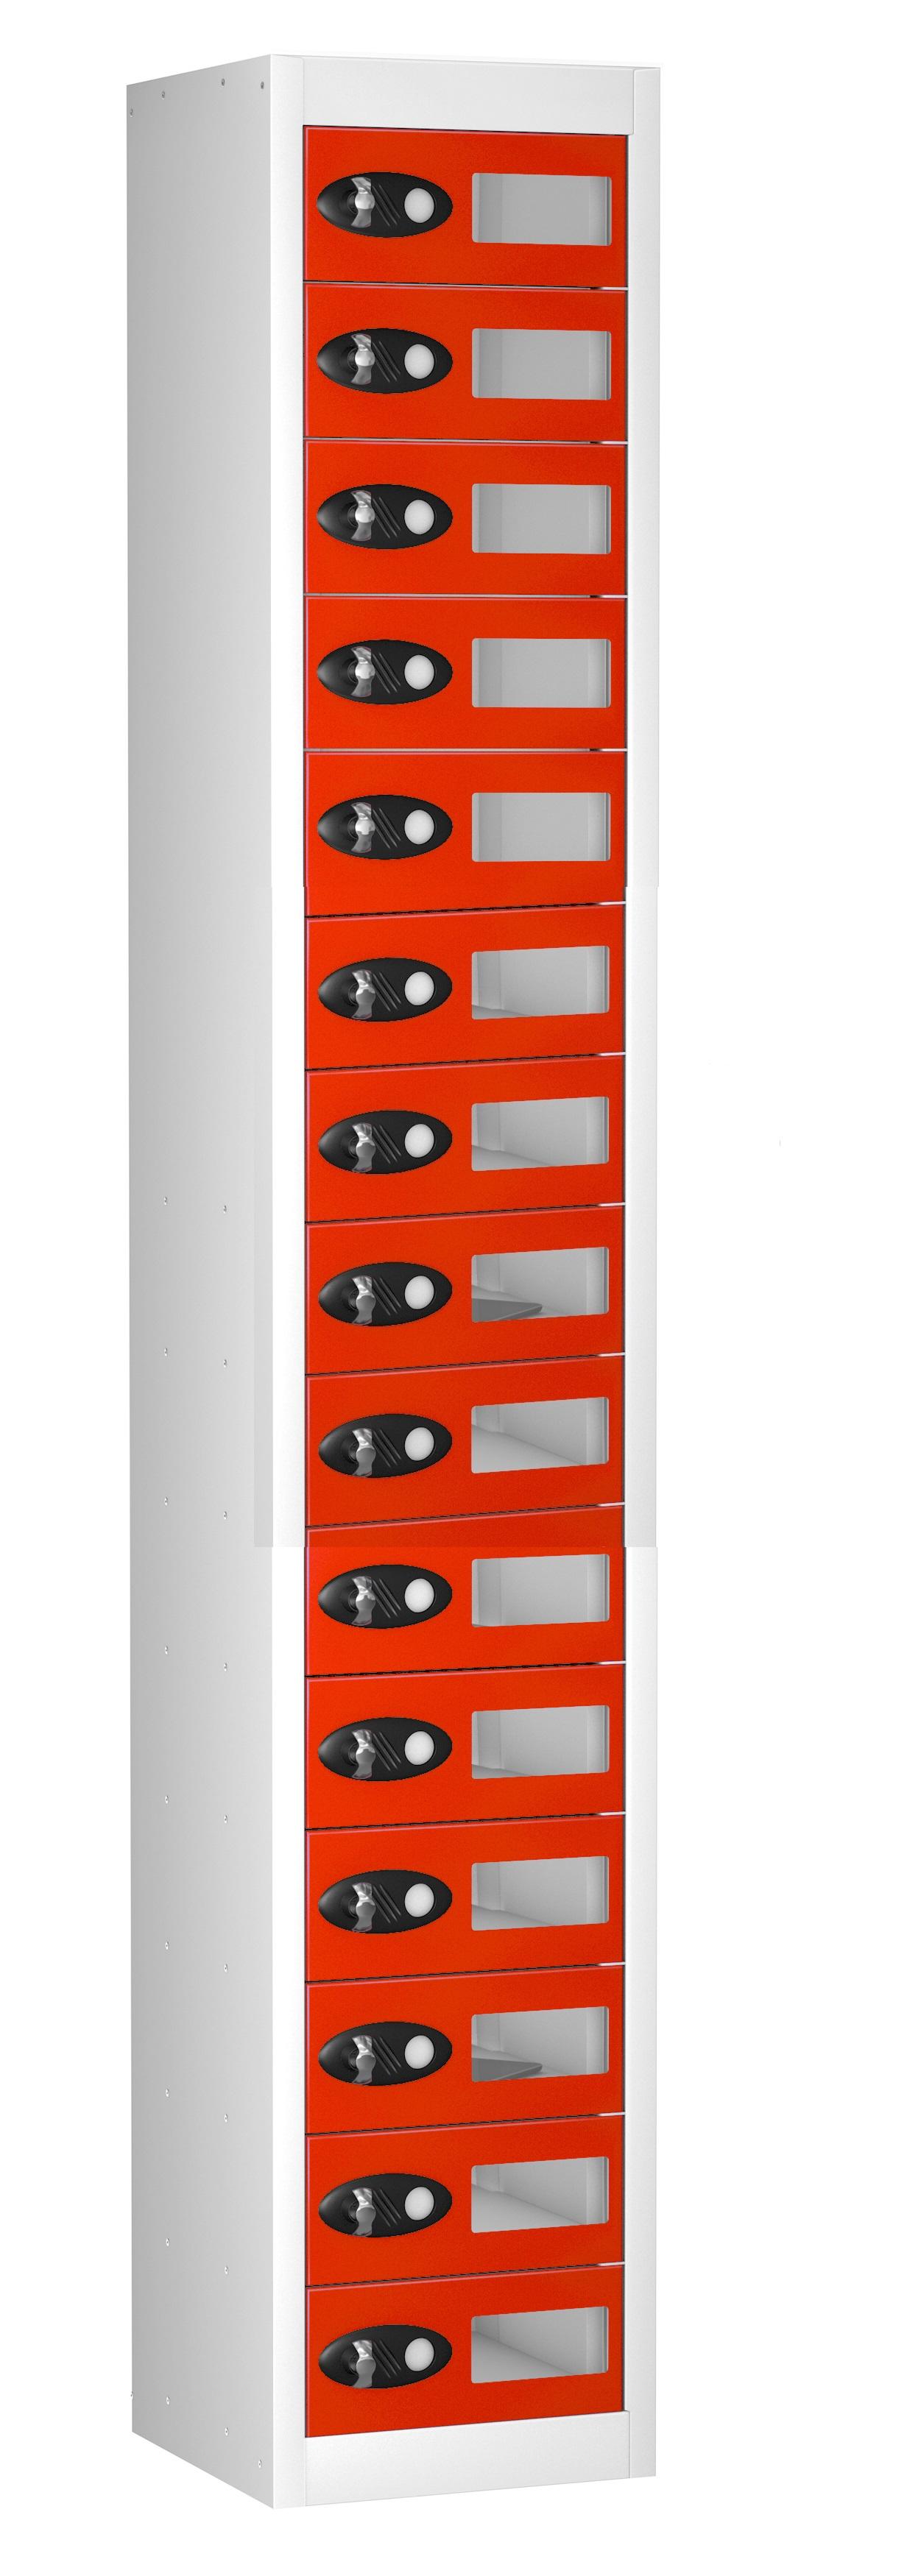 VISION PANEL TABLET Storage Locker -15 Doors (Non Charging)